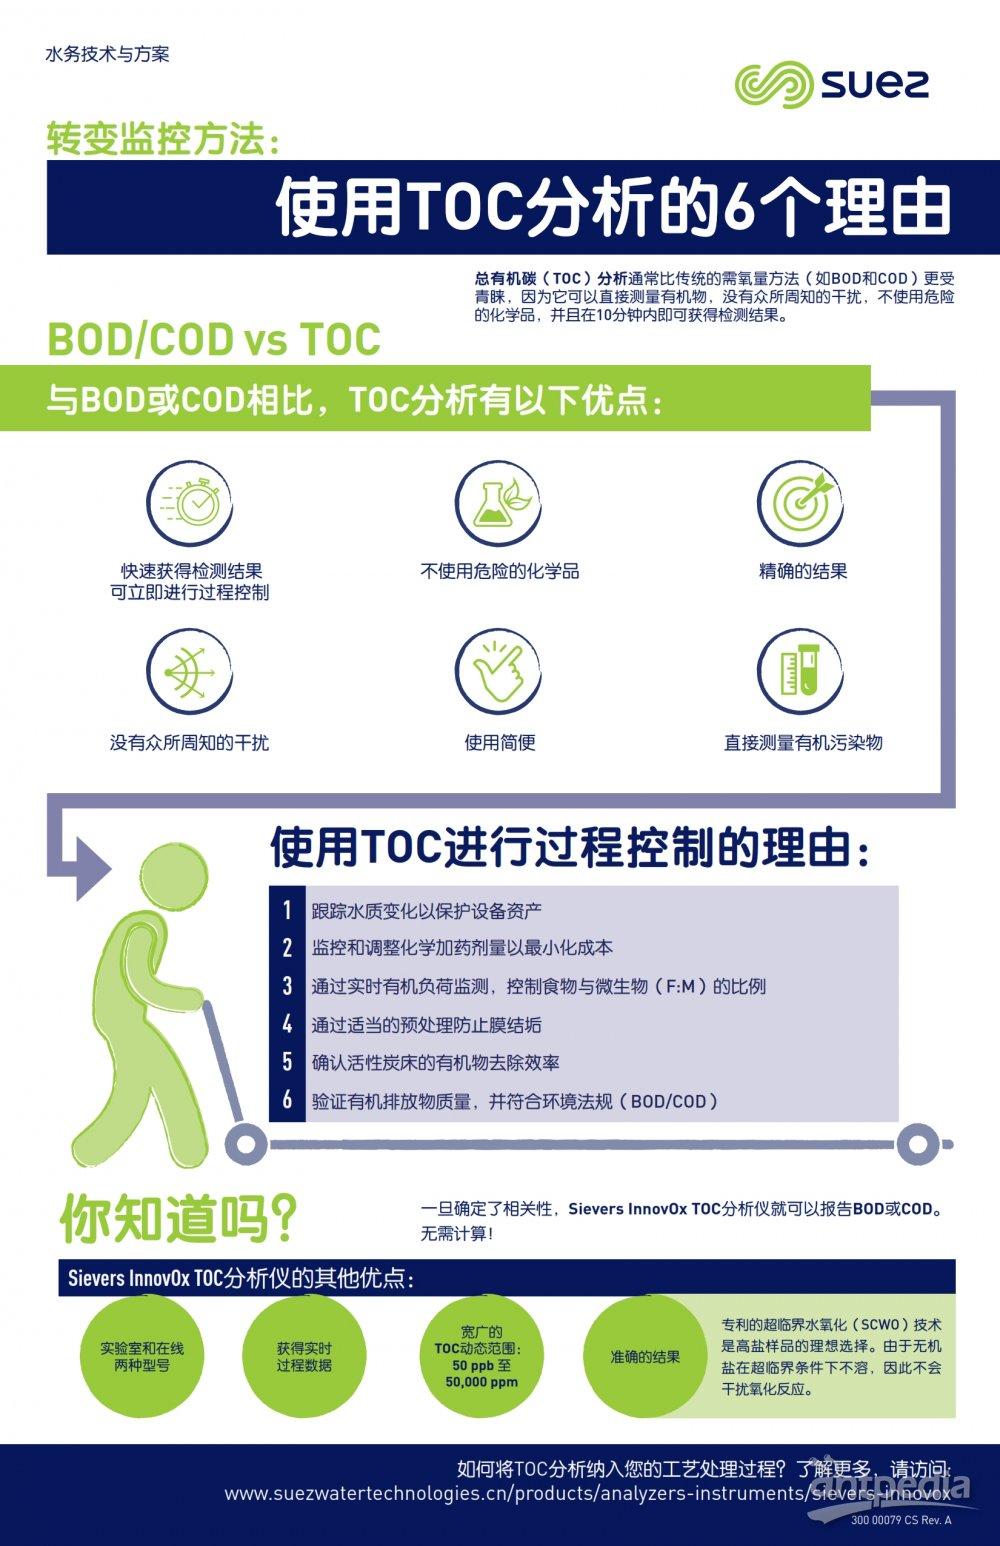 300 00079 CS - Fact Sheet - 6 Reasons for TOC_001.jpg